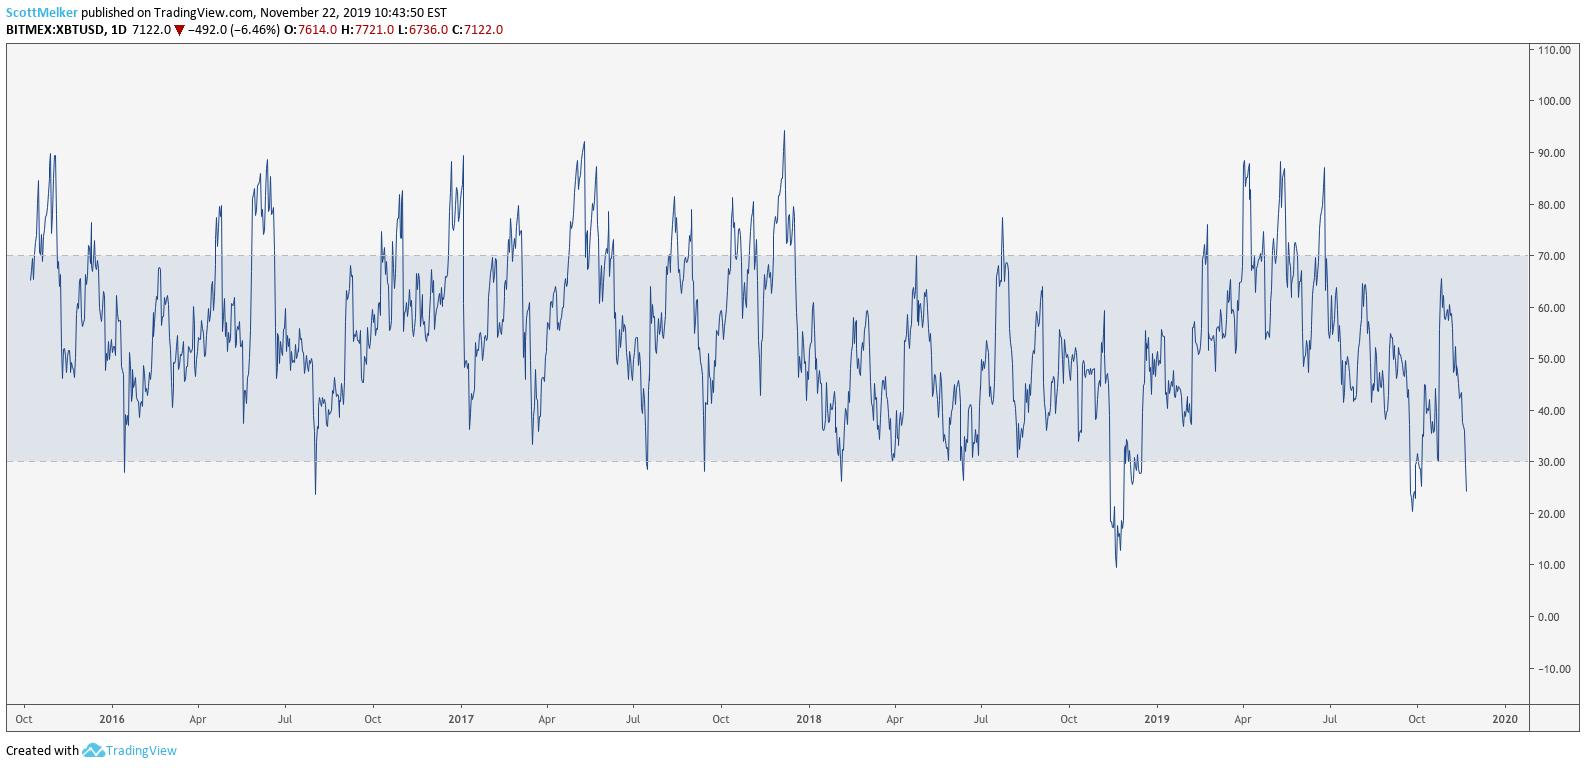 BTC USD daily RSI. Source: TradingView